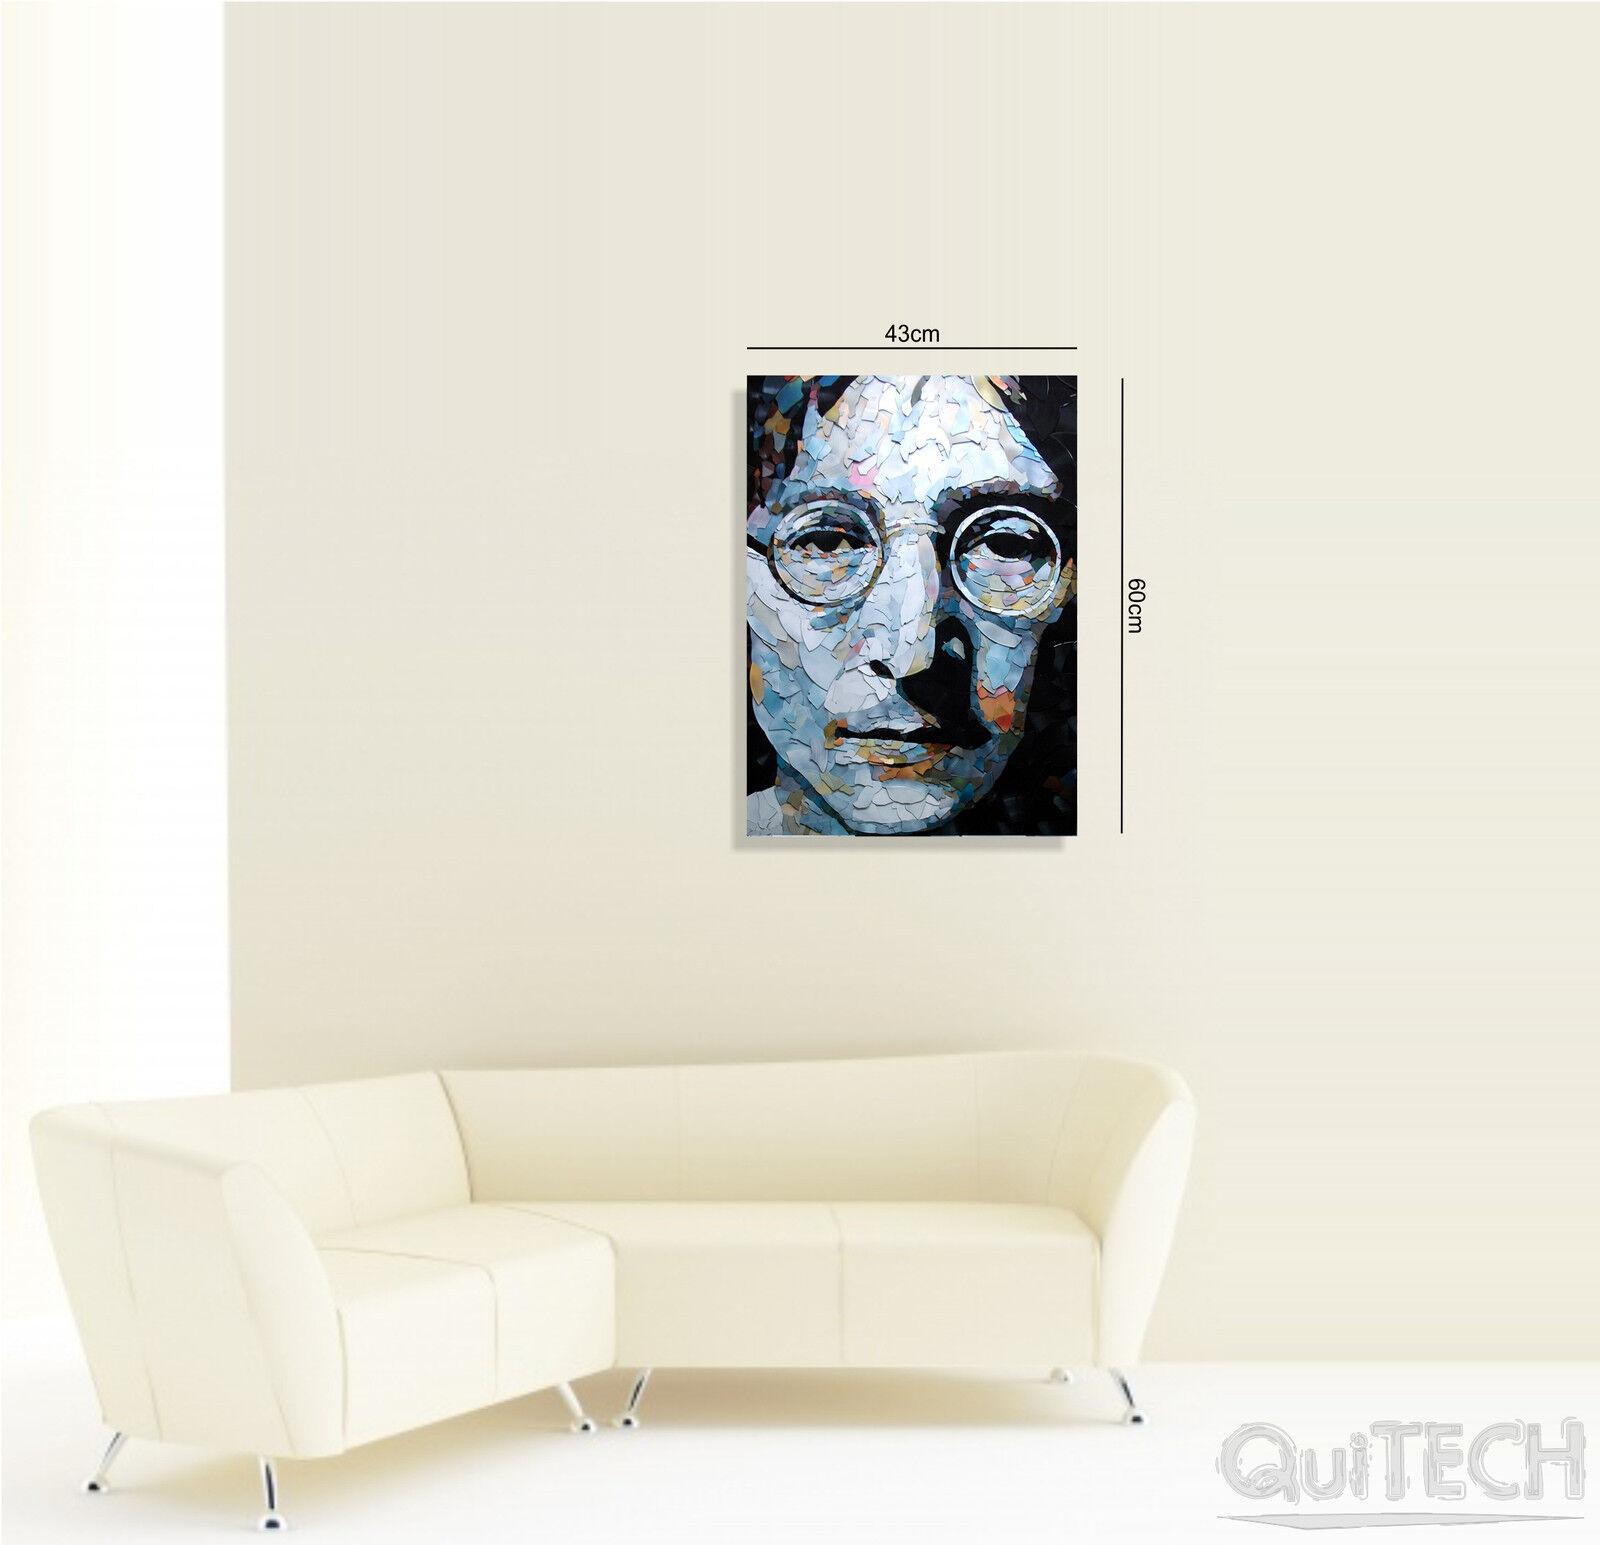 John Lennon - 14 stampa - Quadro stampa 14 su Tela Pelle Canvas Dipinto Arte Moderna 4f0f6b